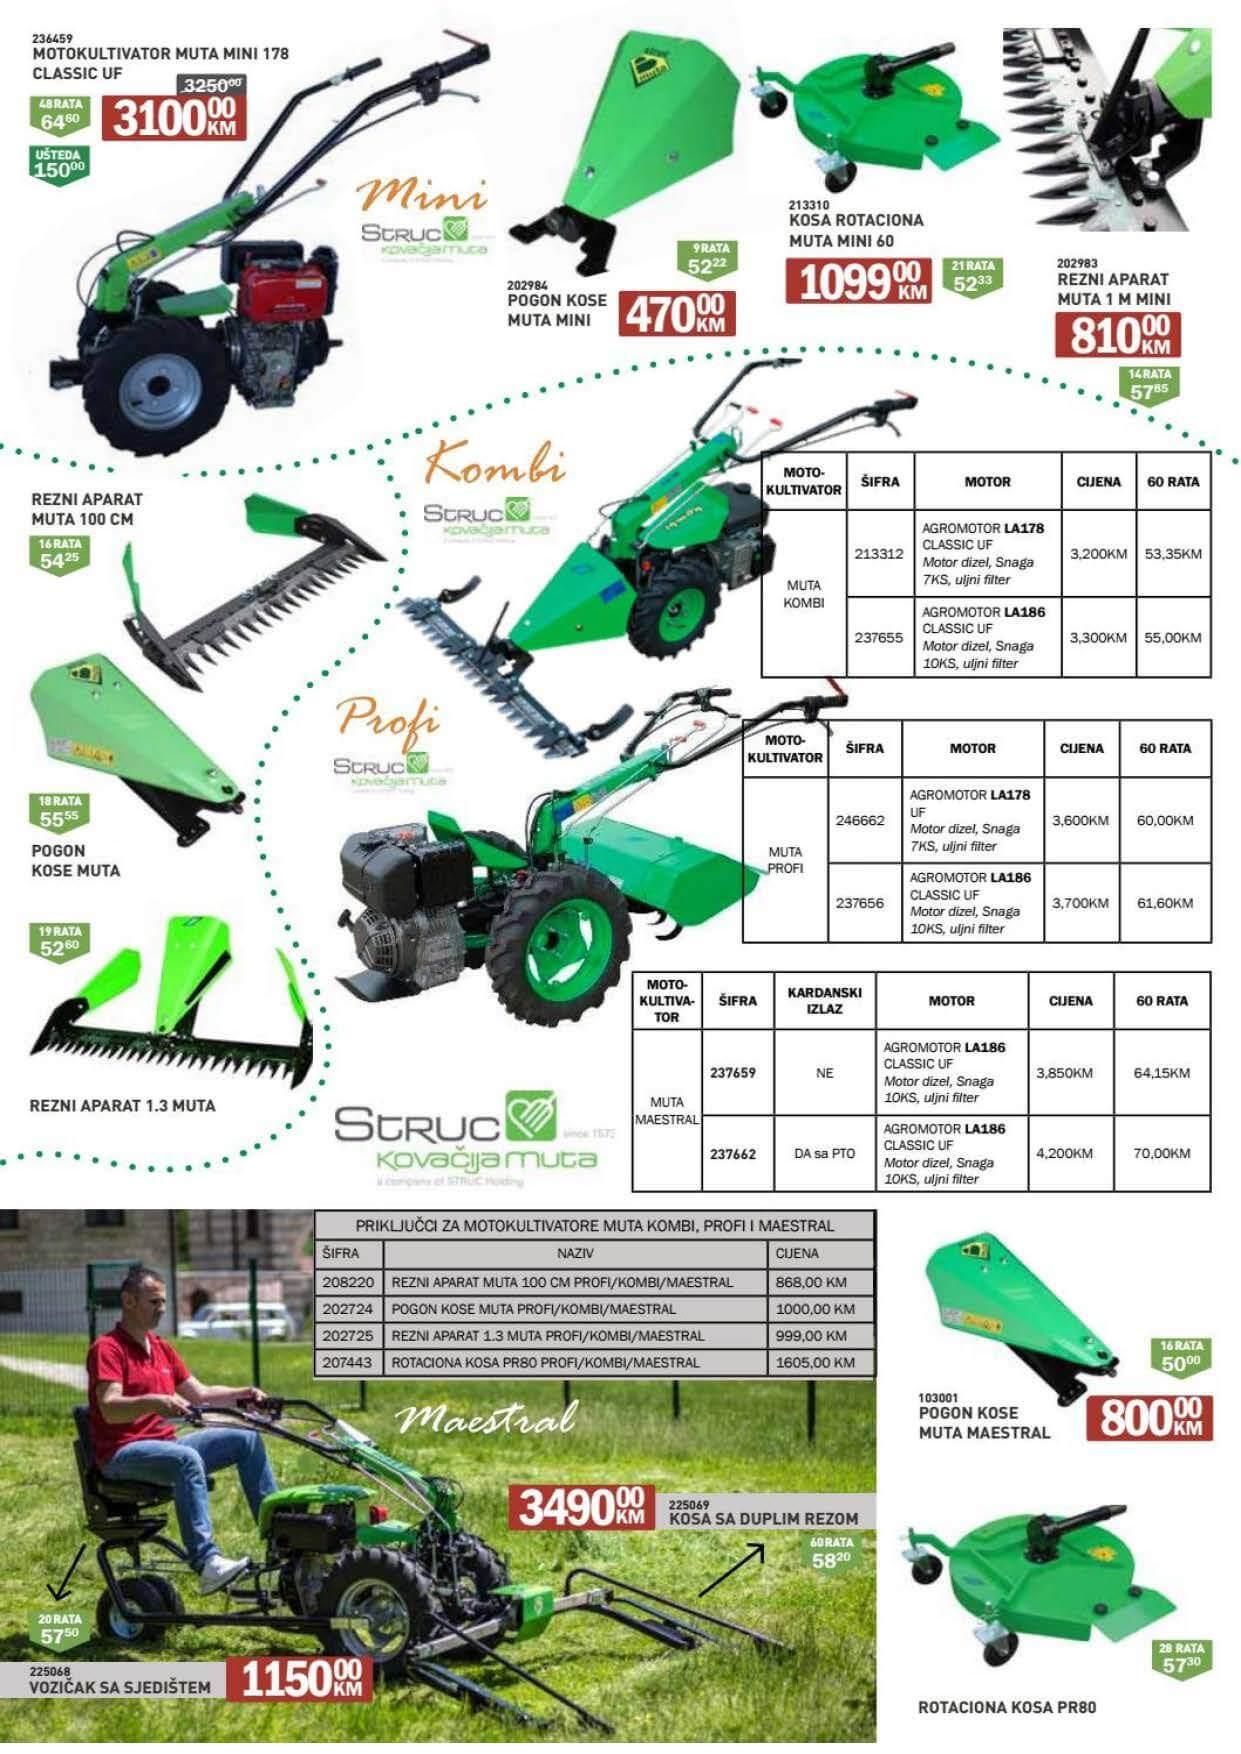 Verno Agromehanika Akcijski Katalog JUN 2021 eKatalozi.com PR Page 08